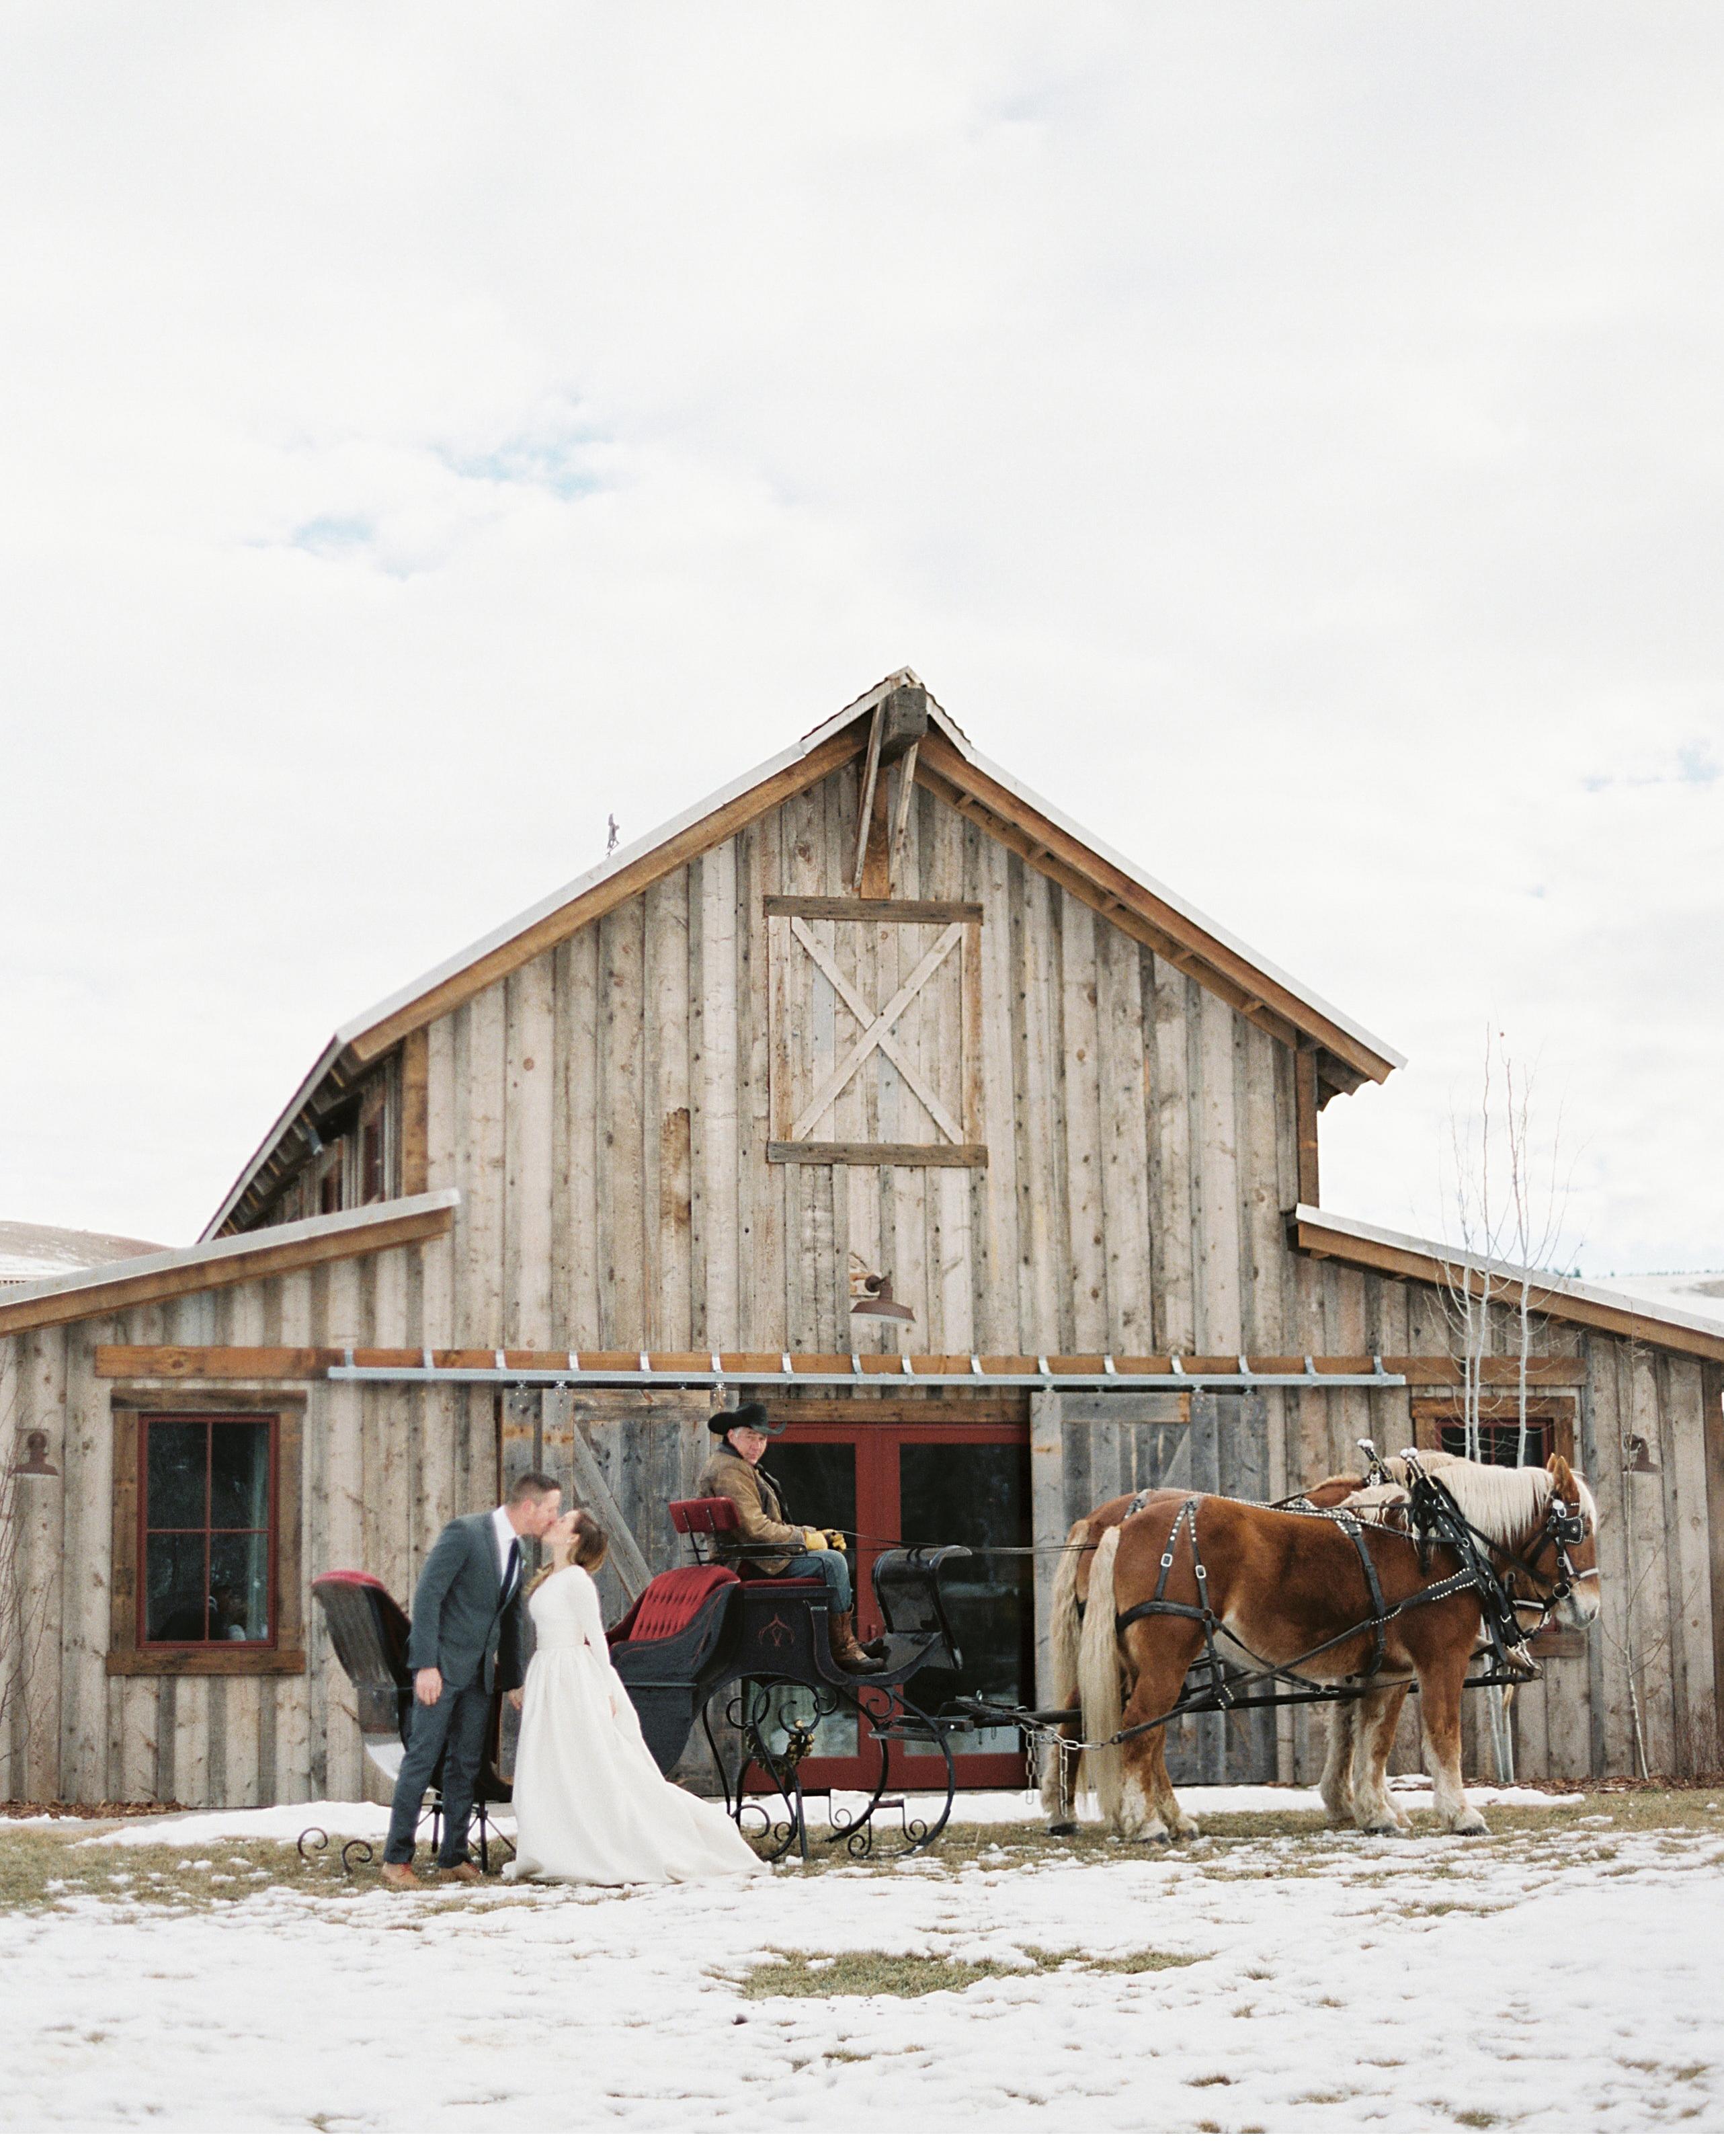 2-wedding-ranch-winter-0116.jpg